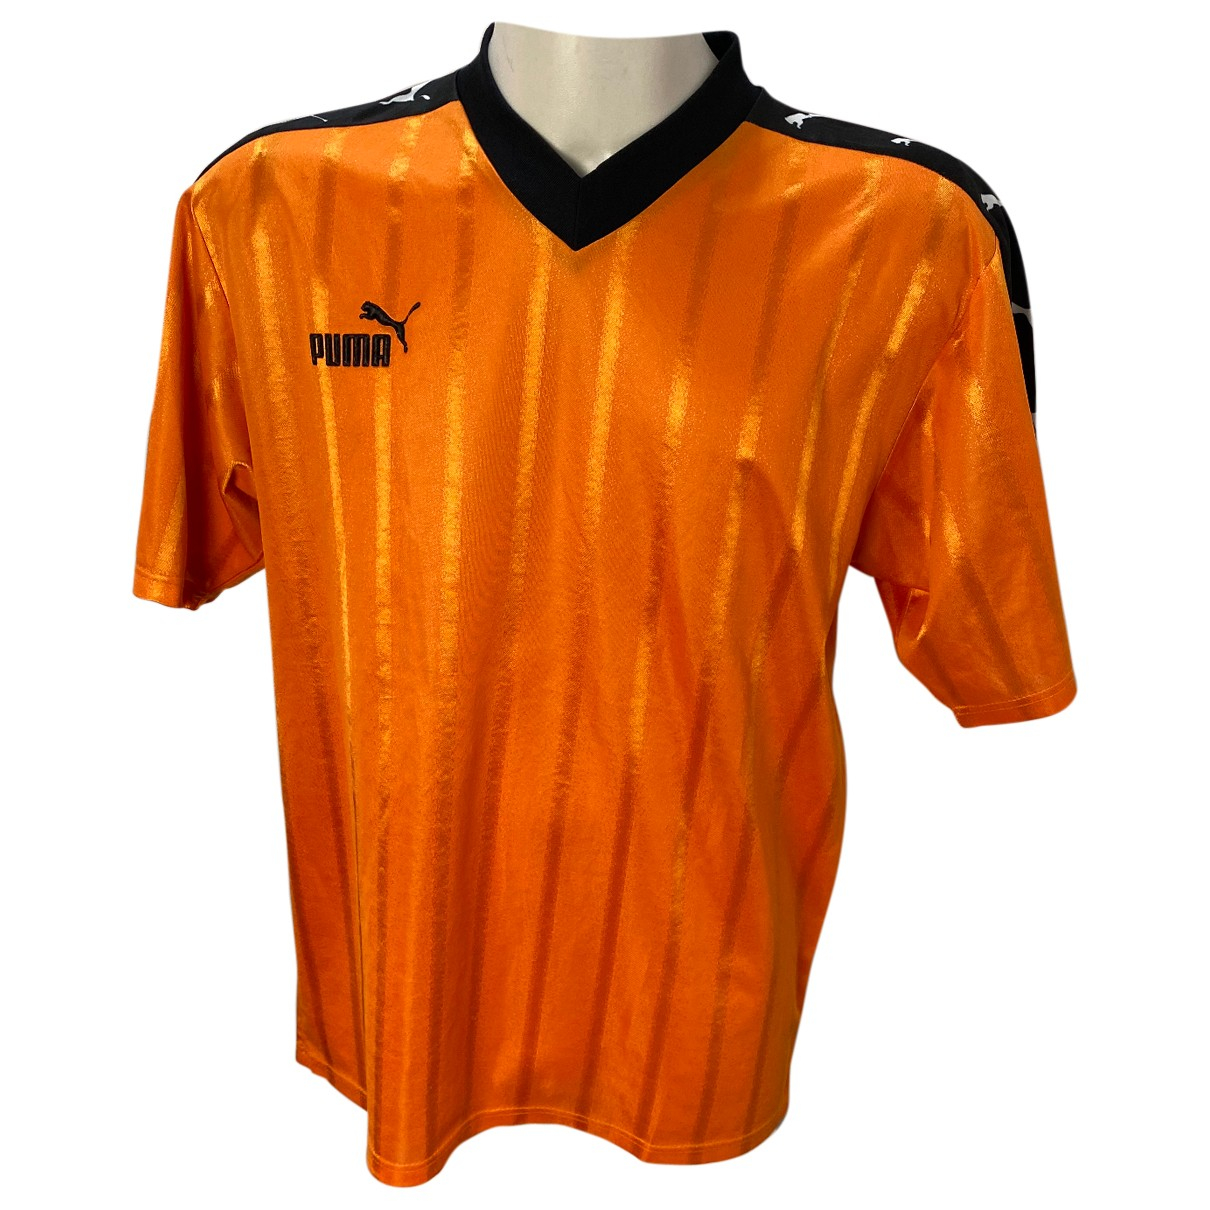 Puma - Tee shirts   pour homme - orange